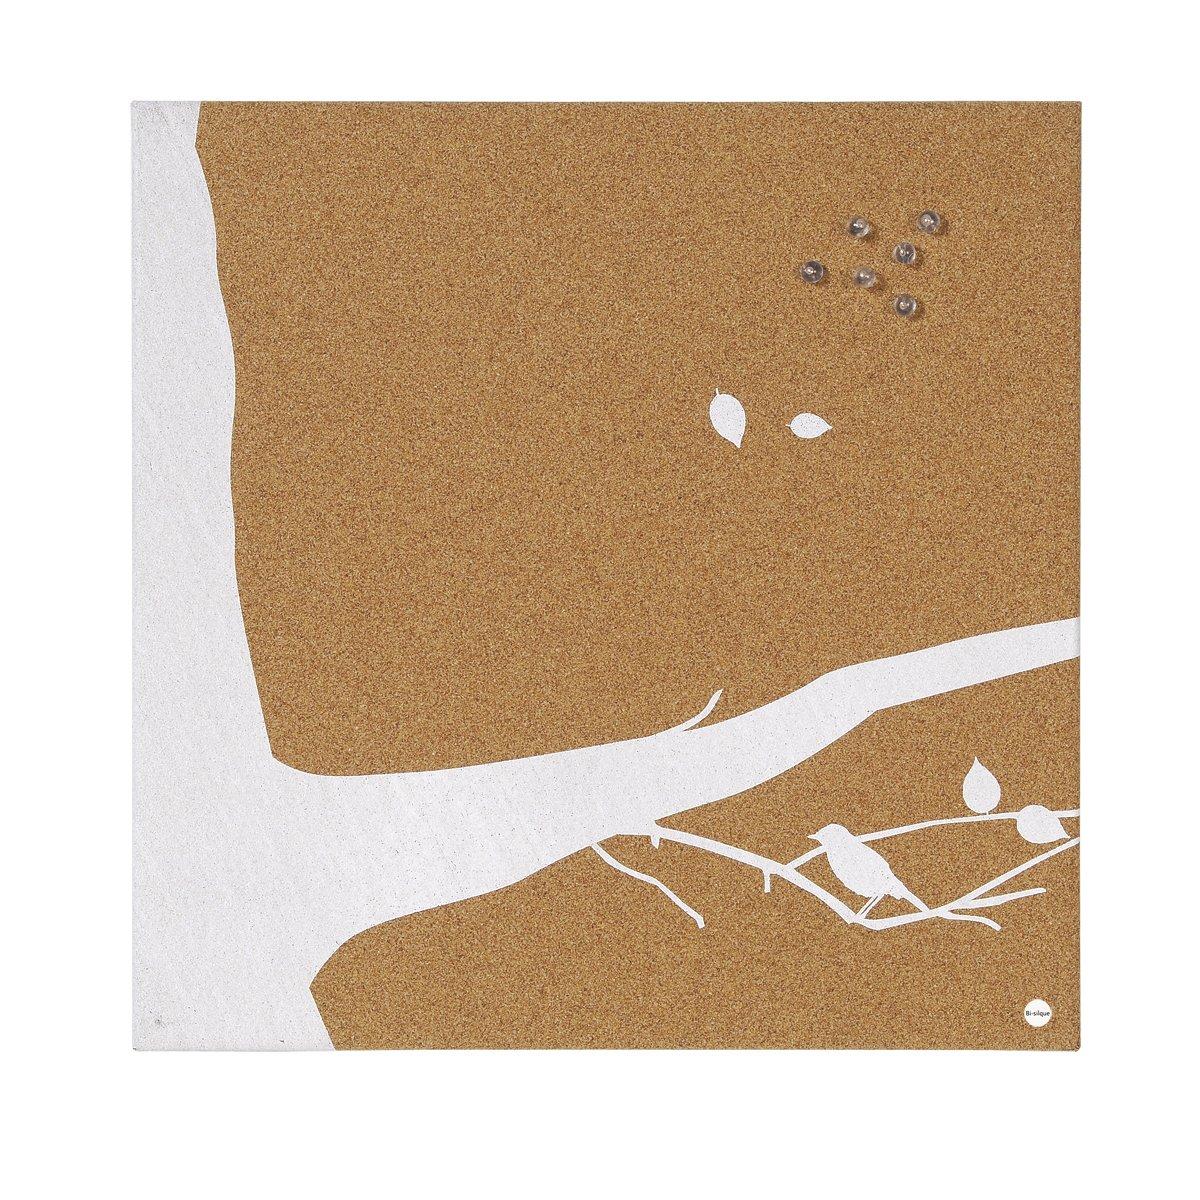 Swallow SF751268397 Bi-Office Cork Notice Board 40 x 40 cm Natural